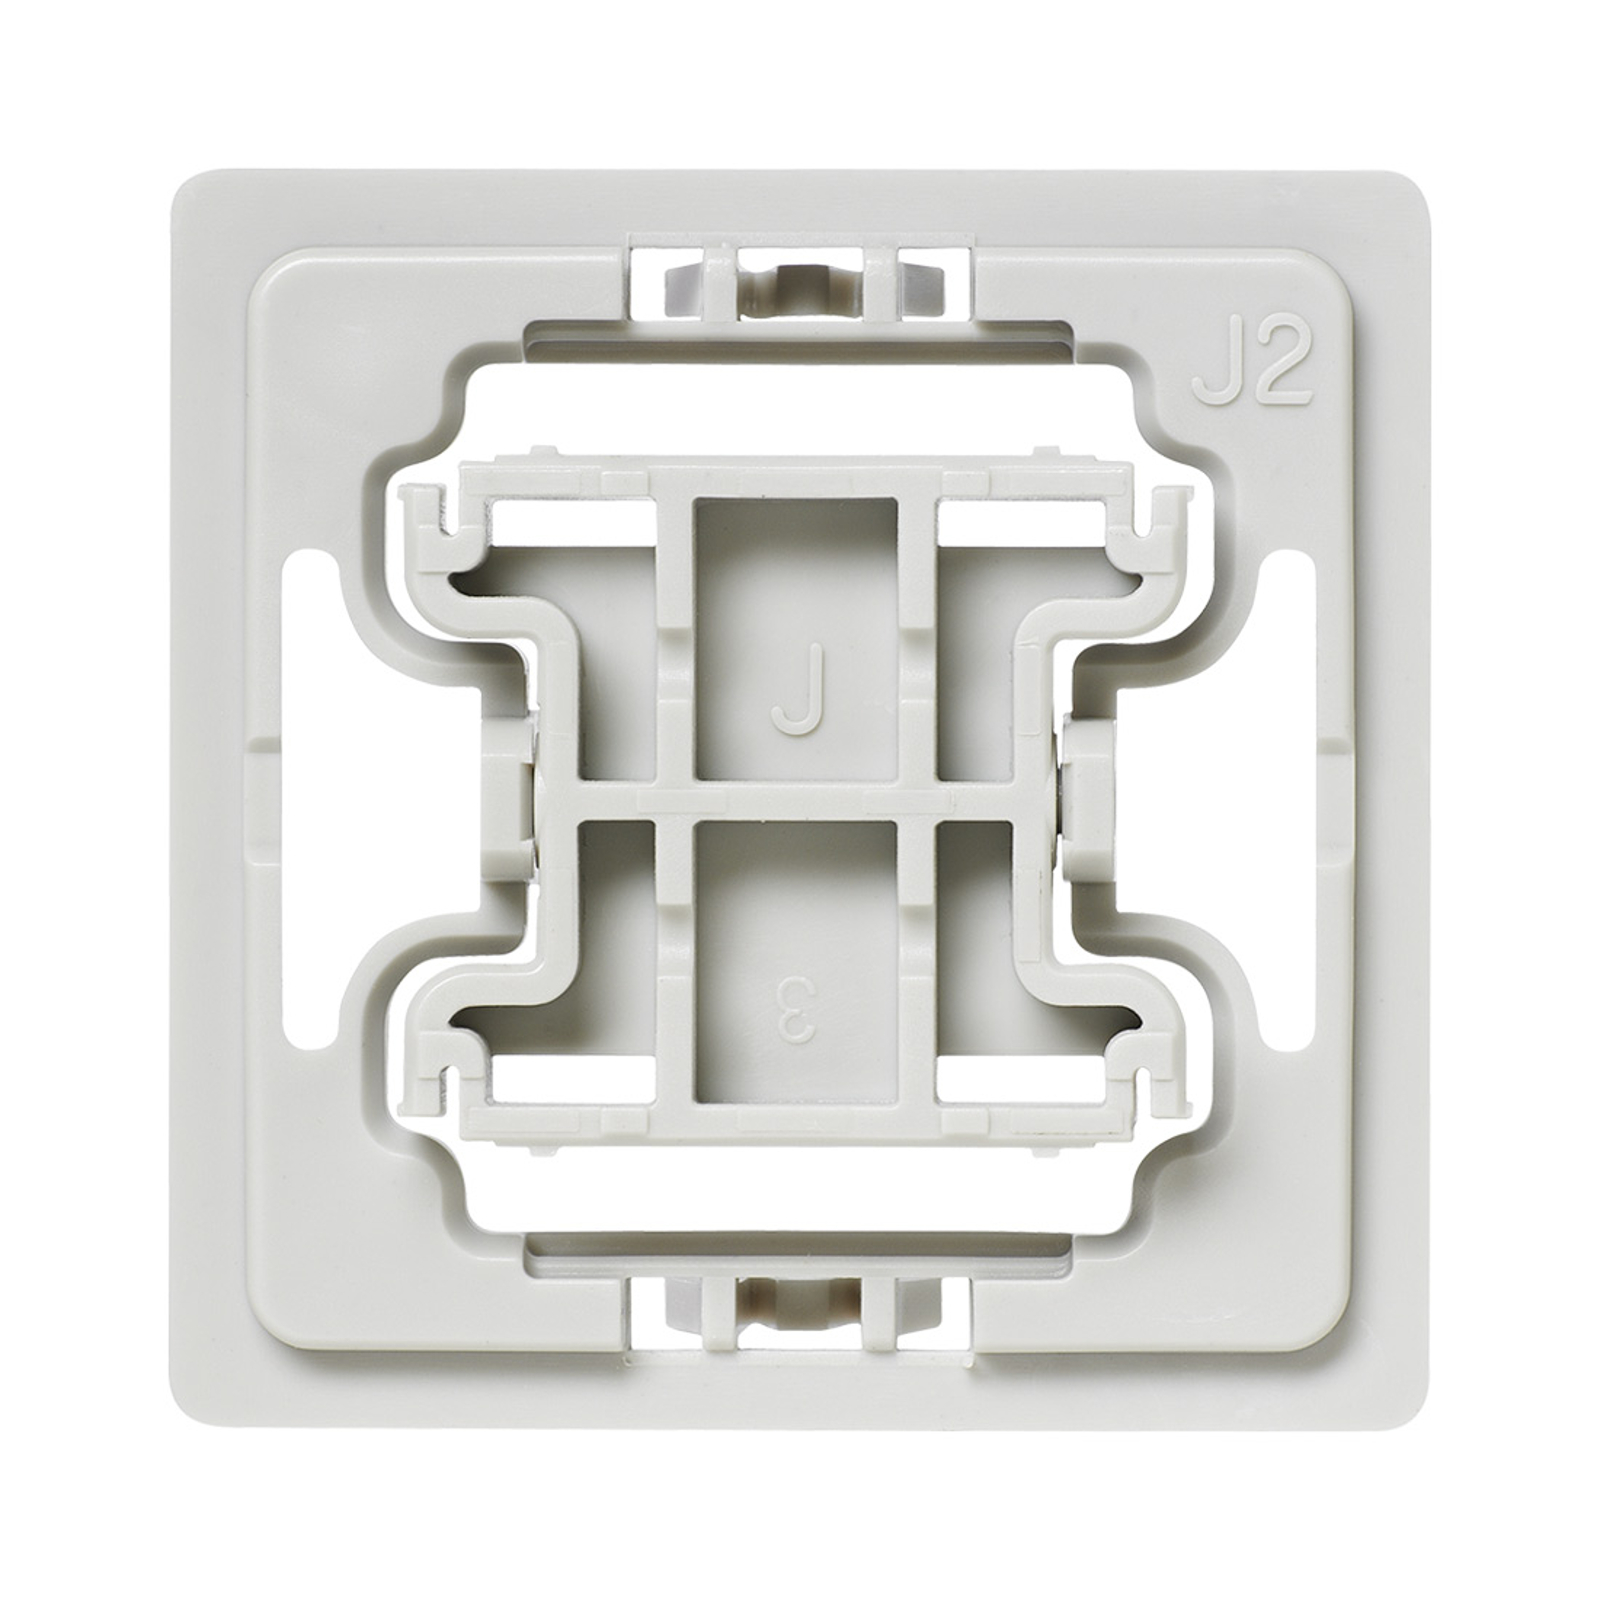 Homematic IP Adapter für Jung Schalter J2 20x